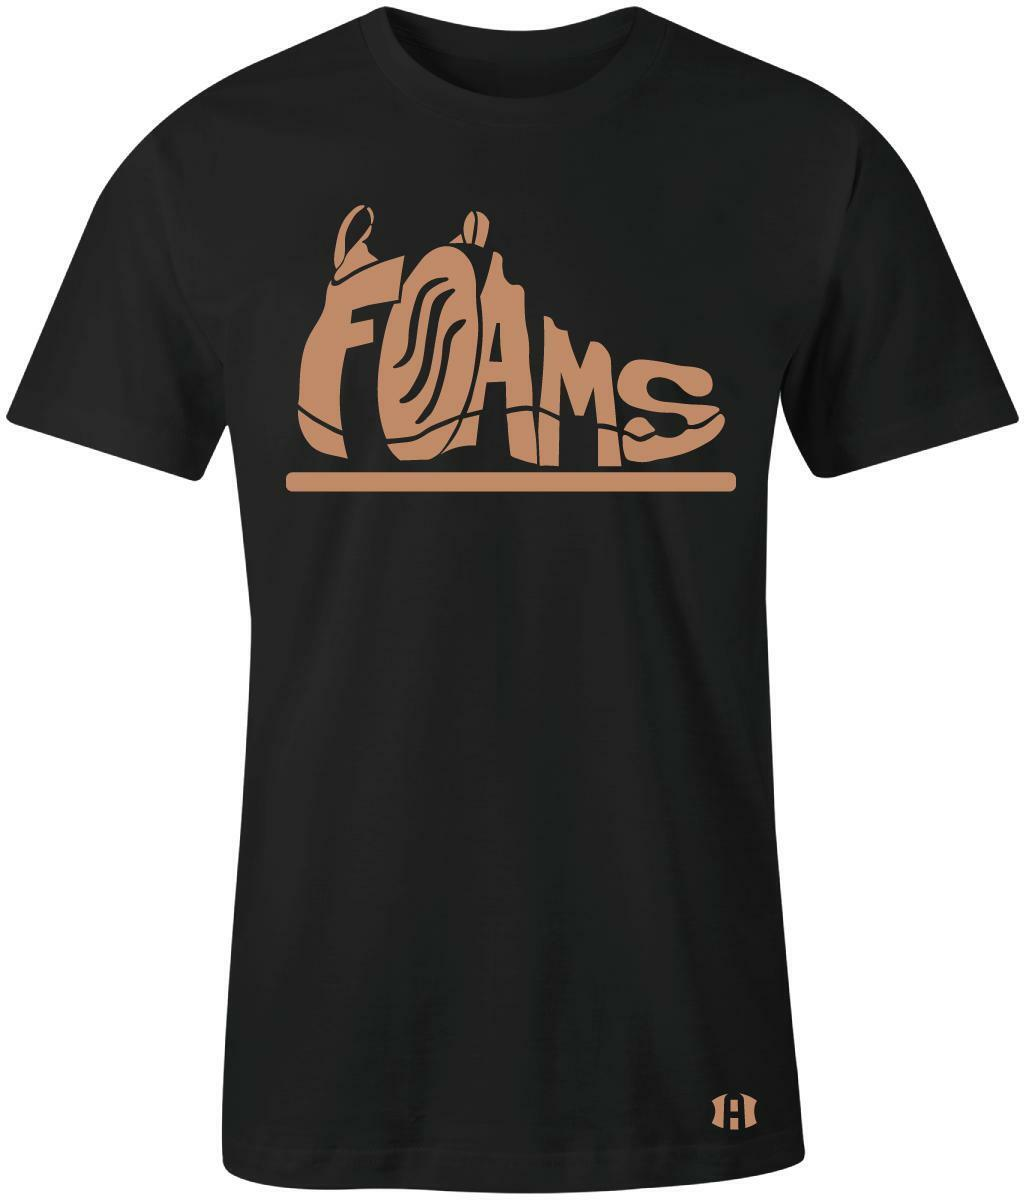 Foams  T-Shirt to Match Foamposite One  Copper